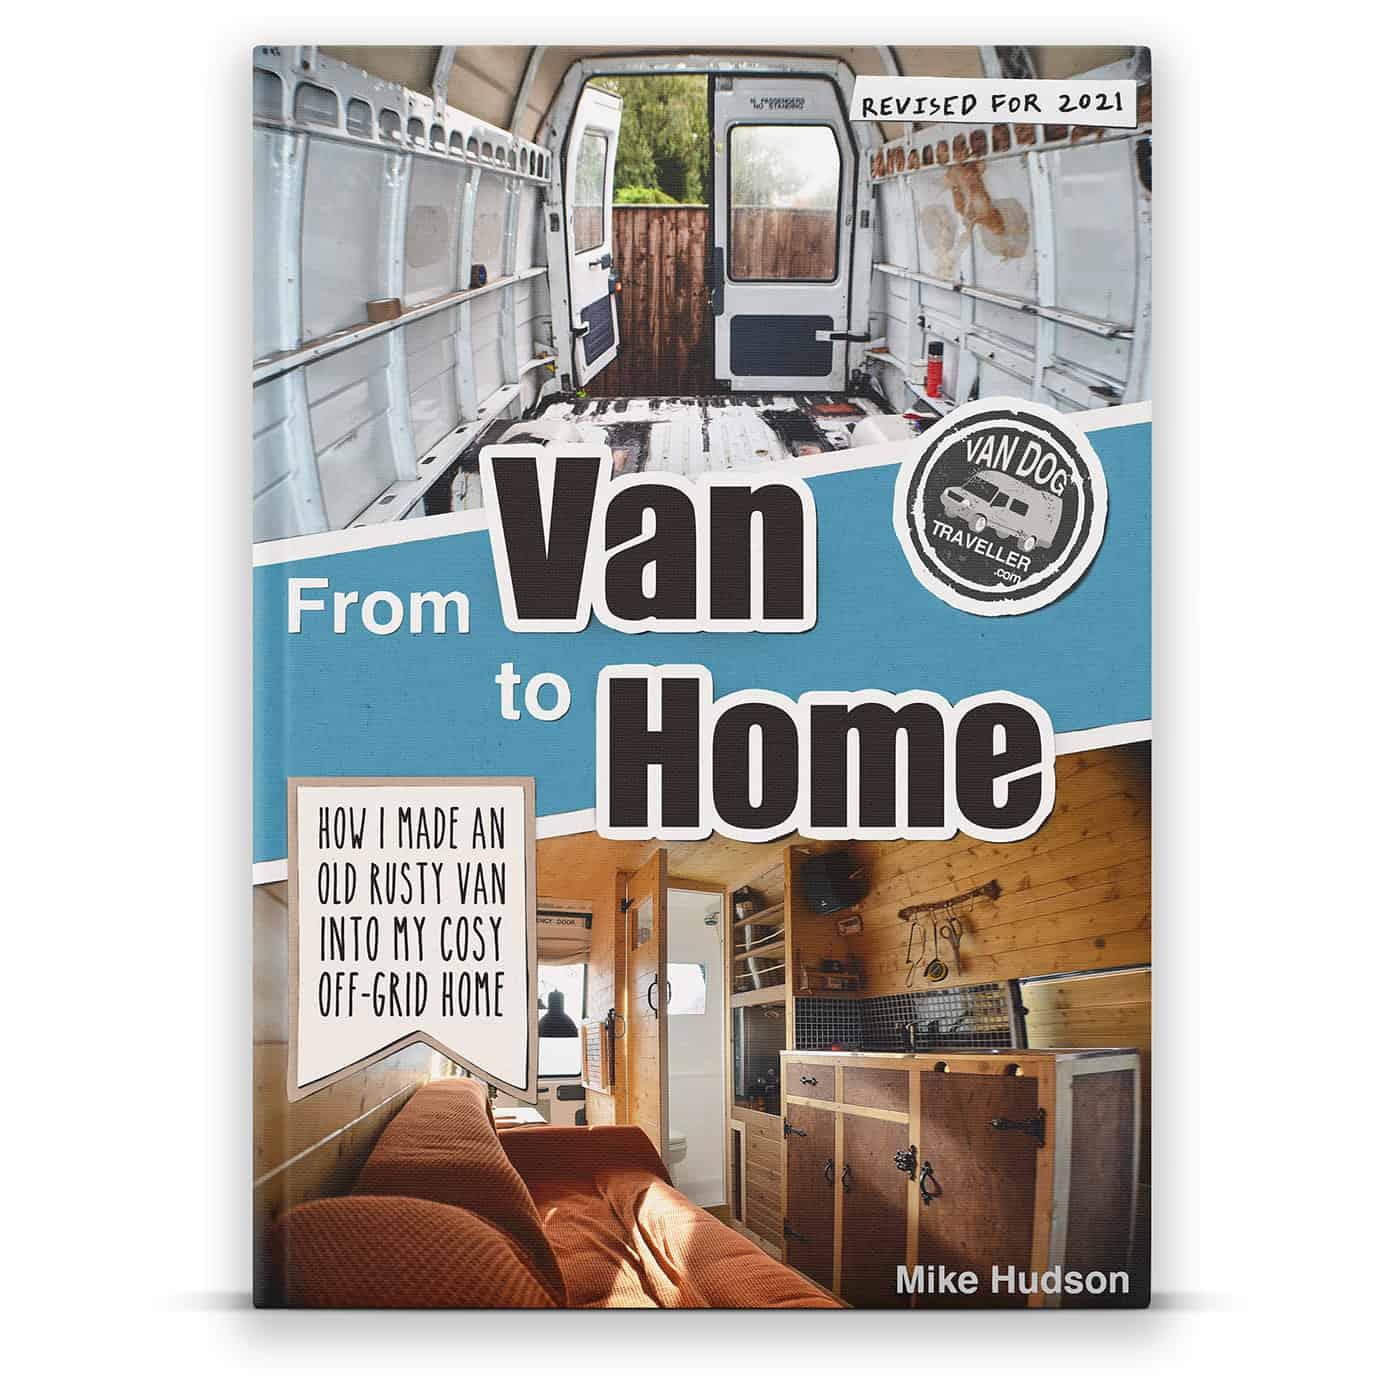 Van conversion book cover  – From Van to Home by Mike Hudson Vandogtraveller